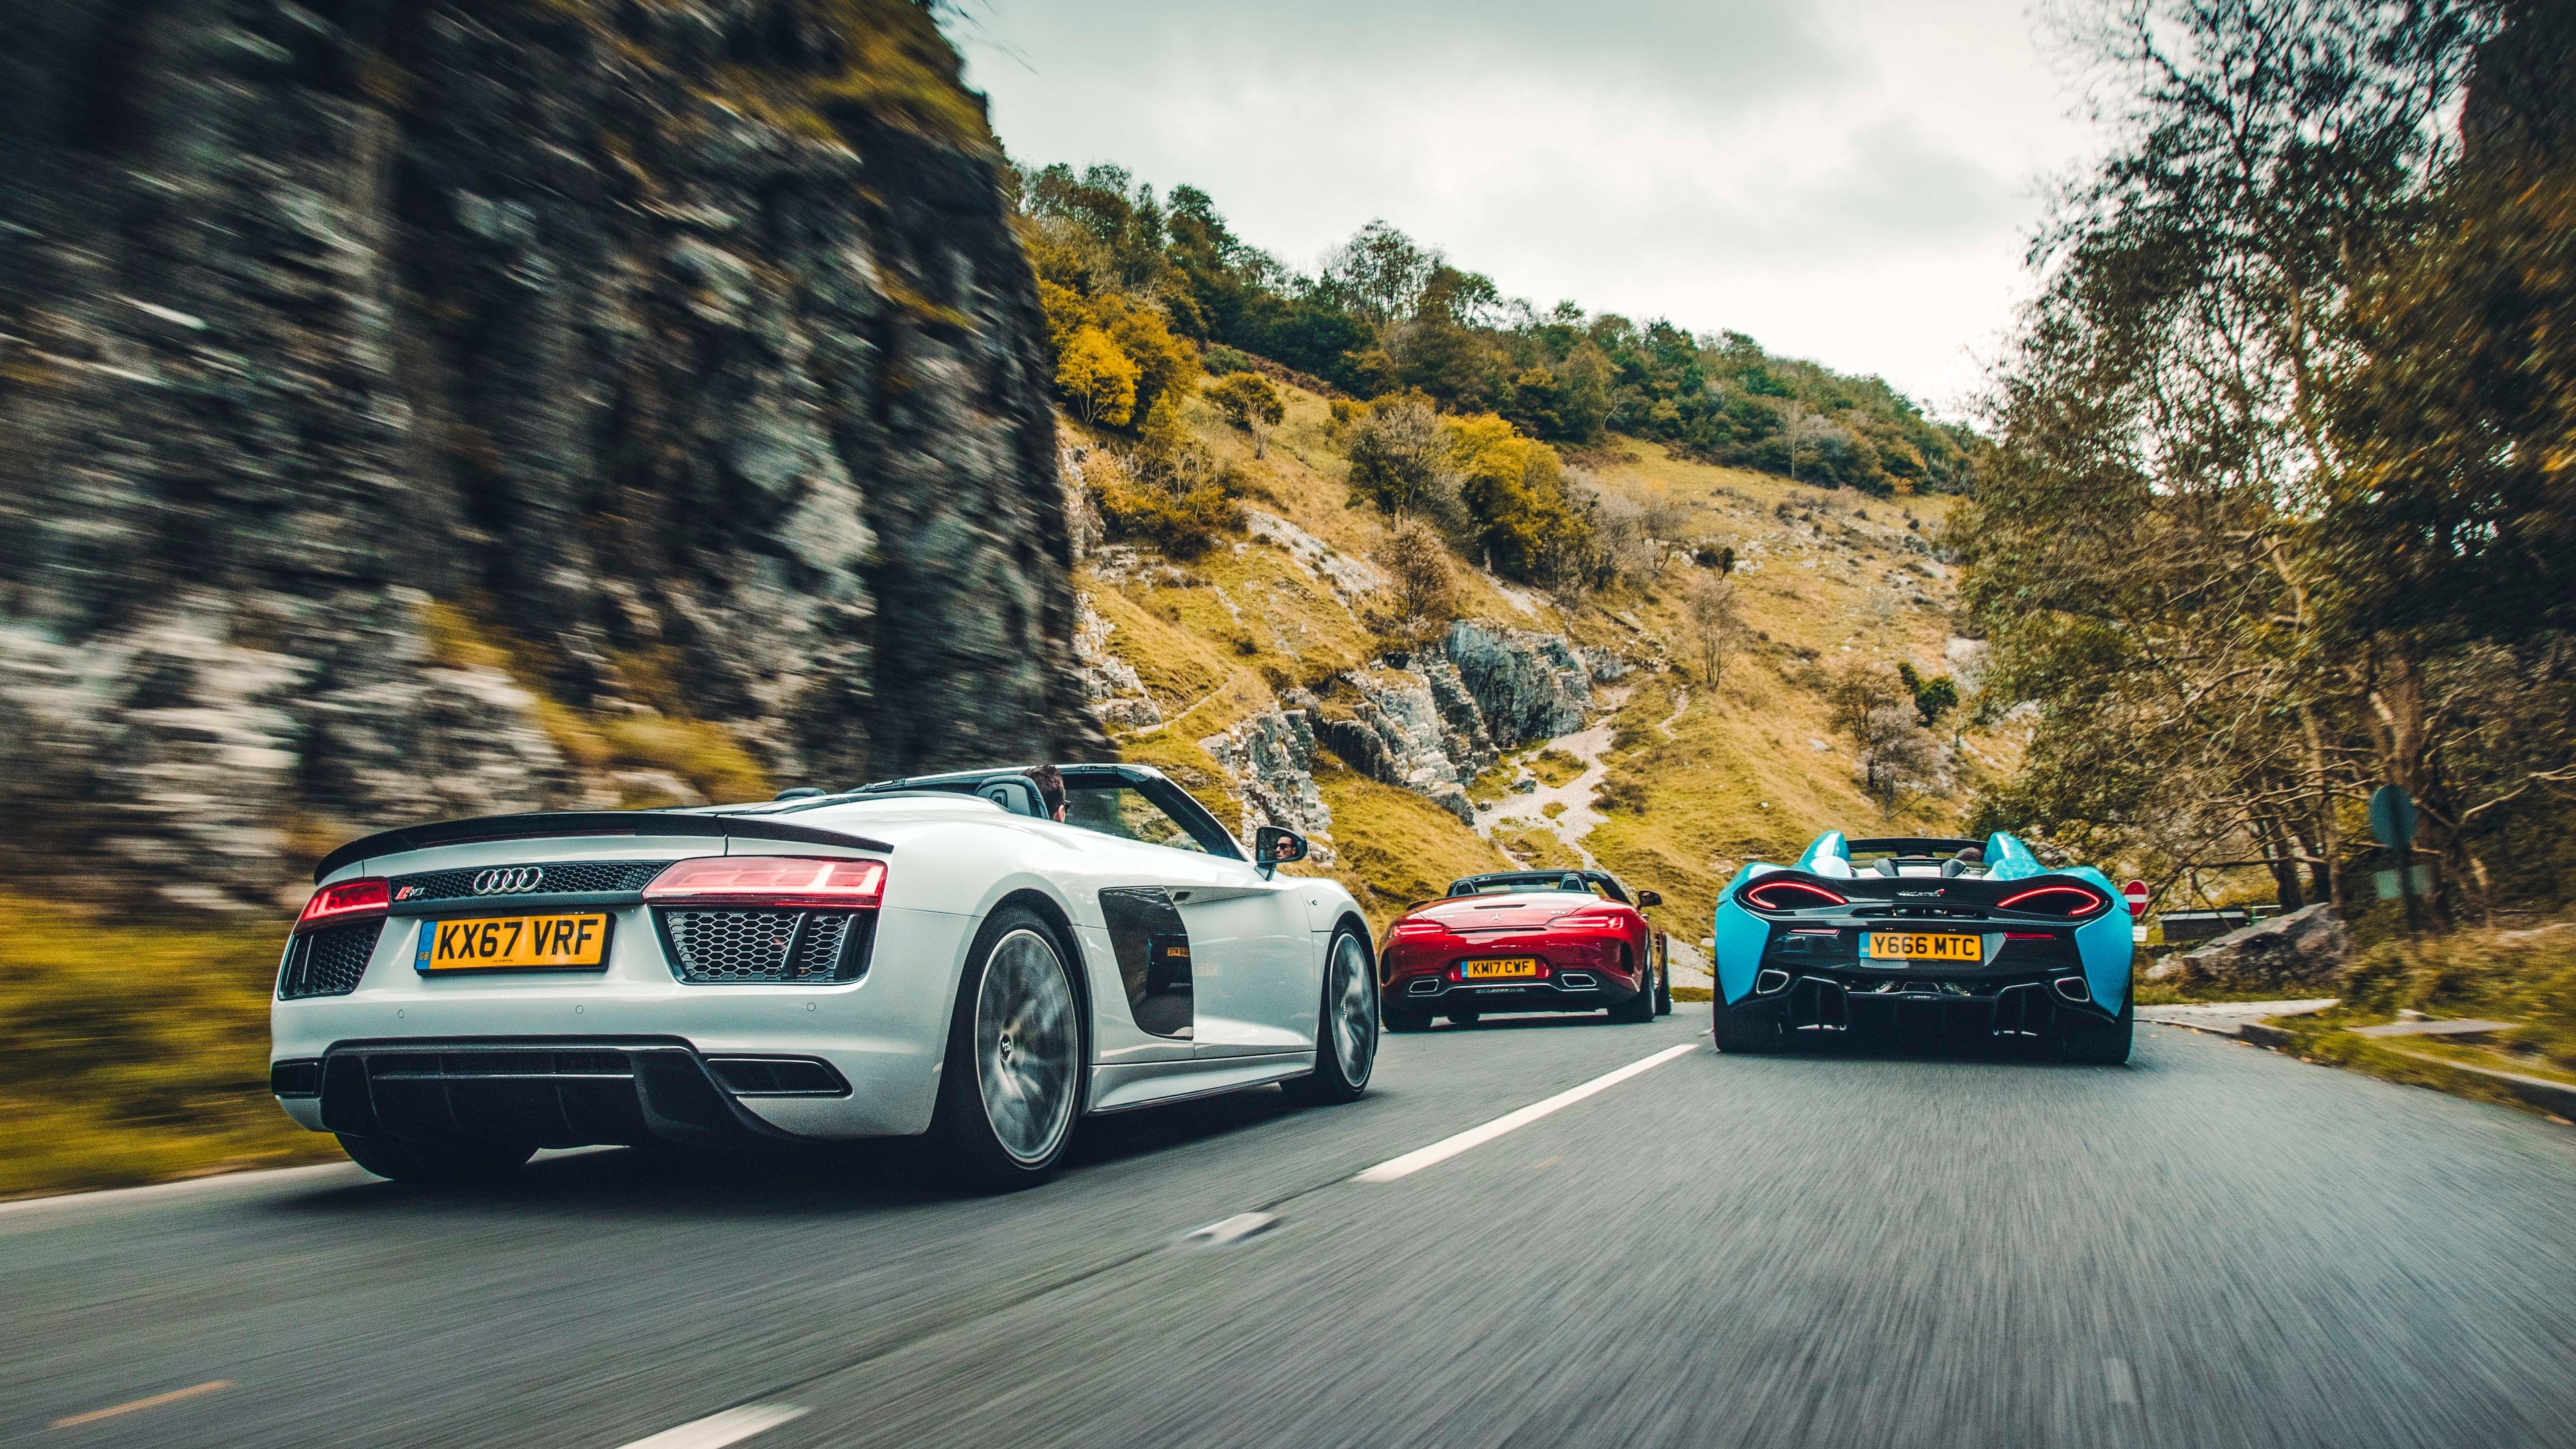 Awesome Audi R8 V10 Plus Wallpaper 4K Images